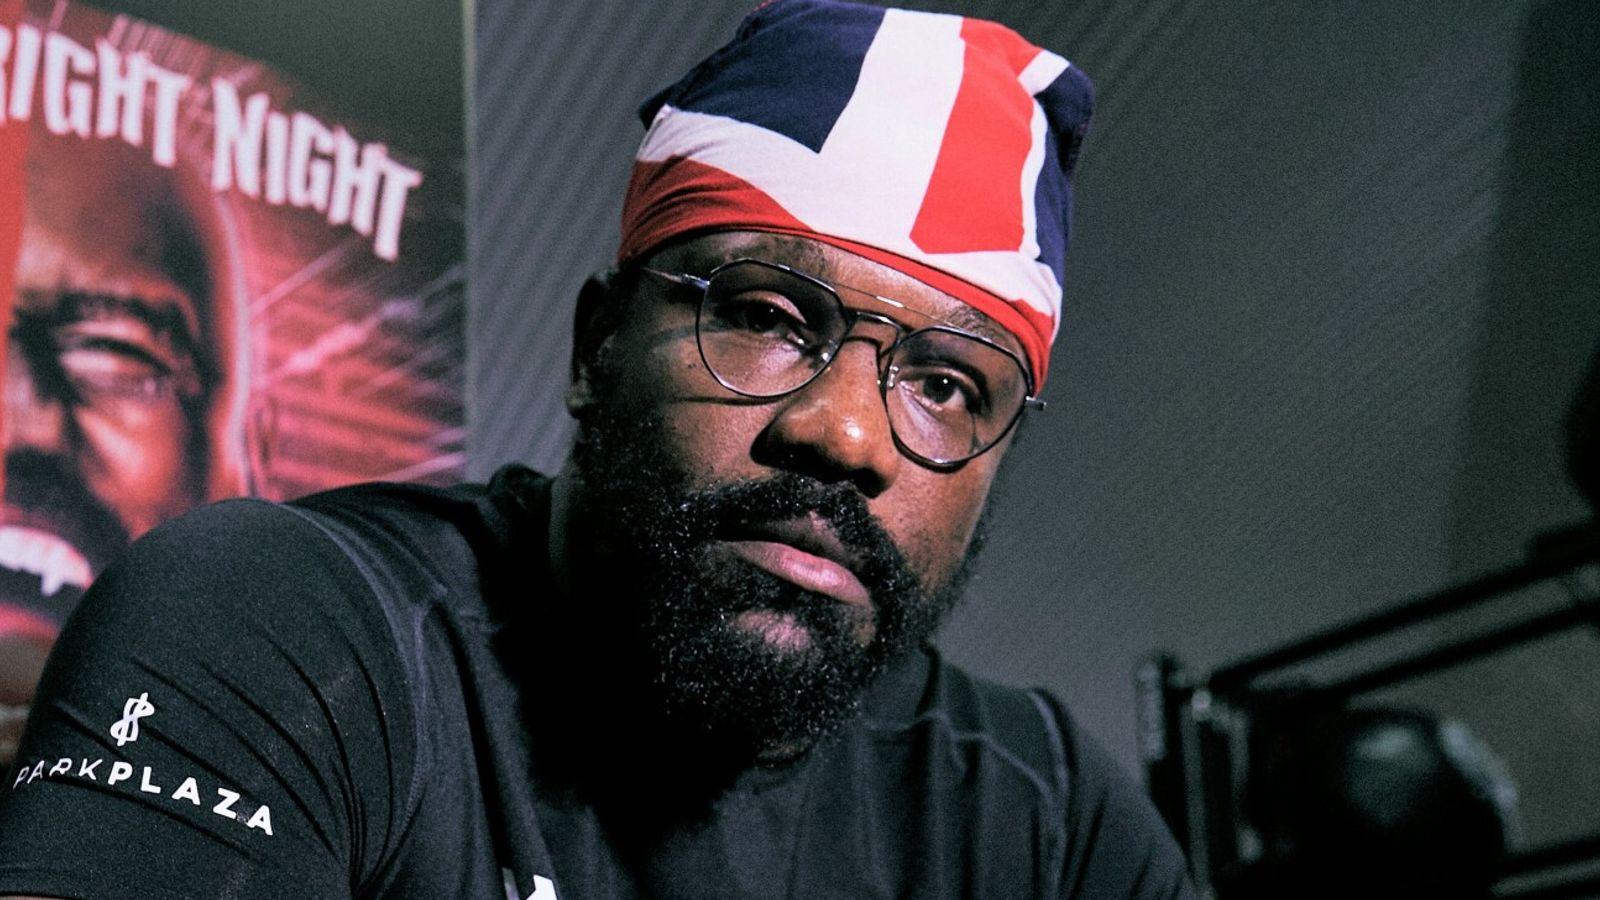 Joseph Parker can't handle Derek Chisora's unbearable 'heat', says British heavyweight coach Buddy McGirt |  Boxing News